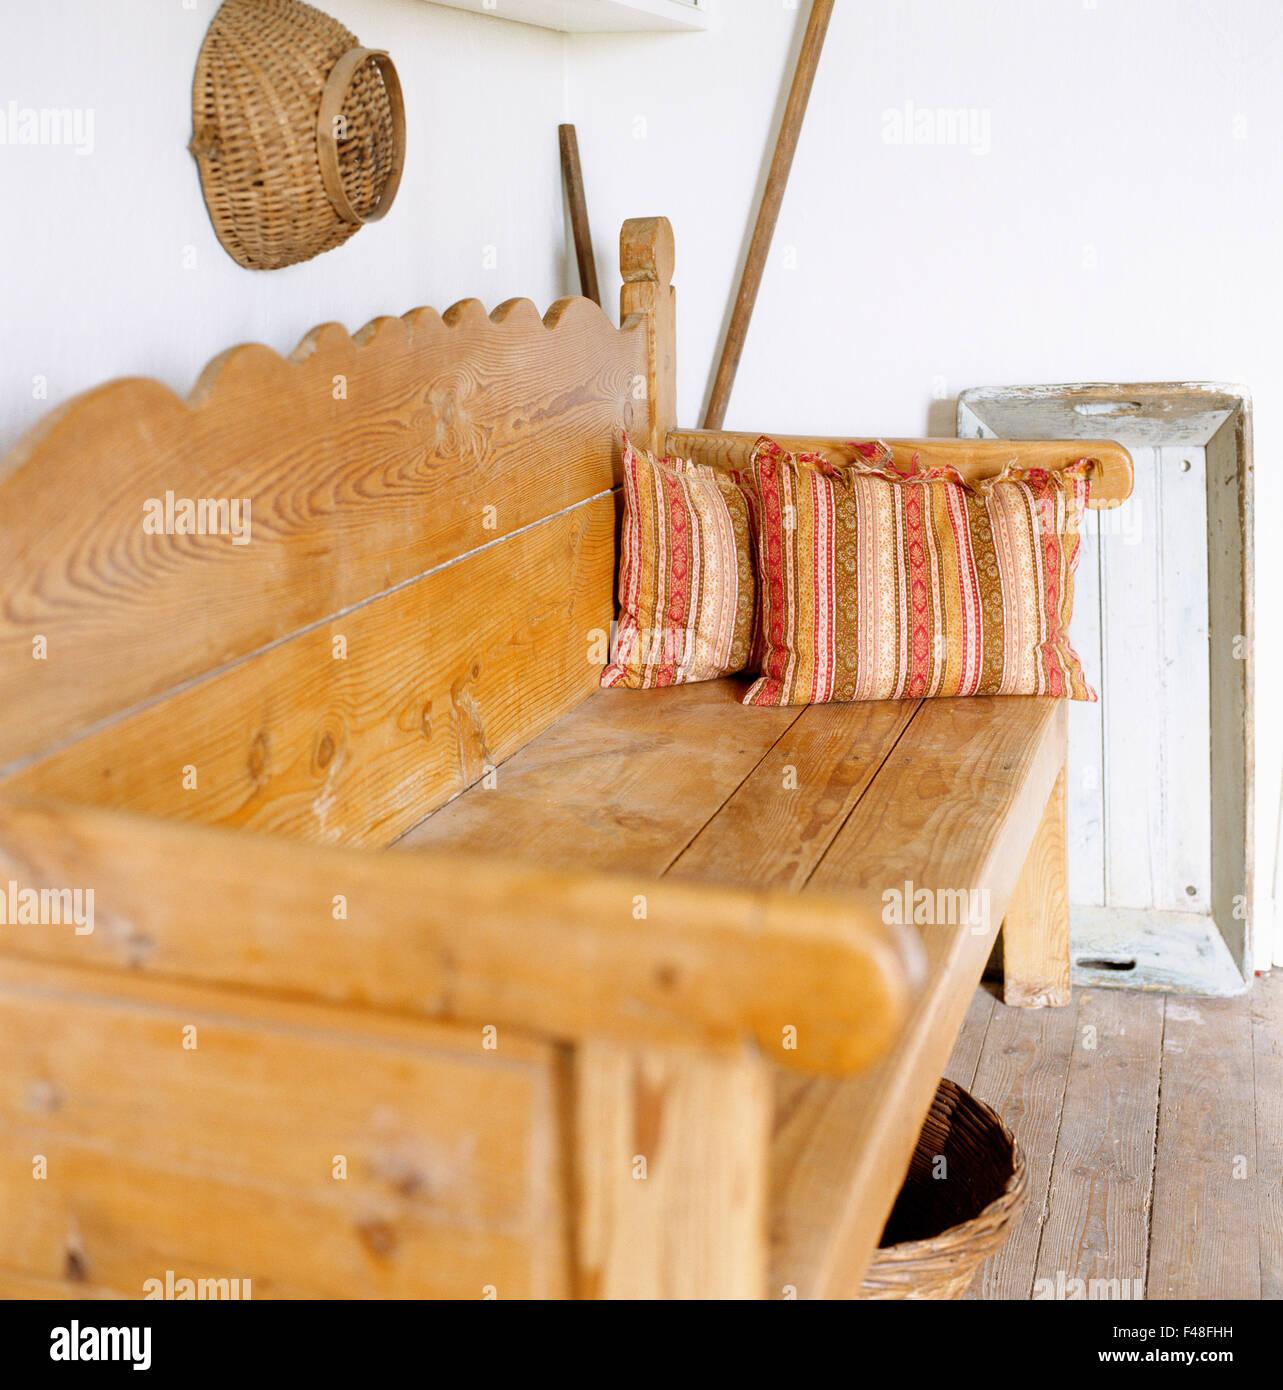 K che sofa schweden stockfoto bild 88698333 alamy for Sofa schweden